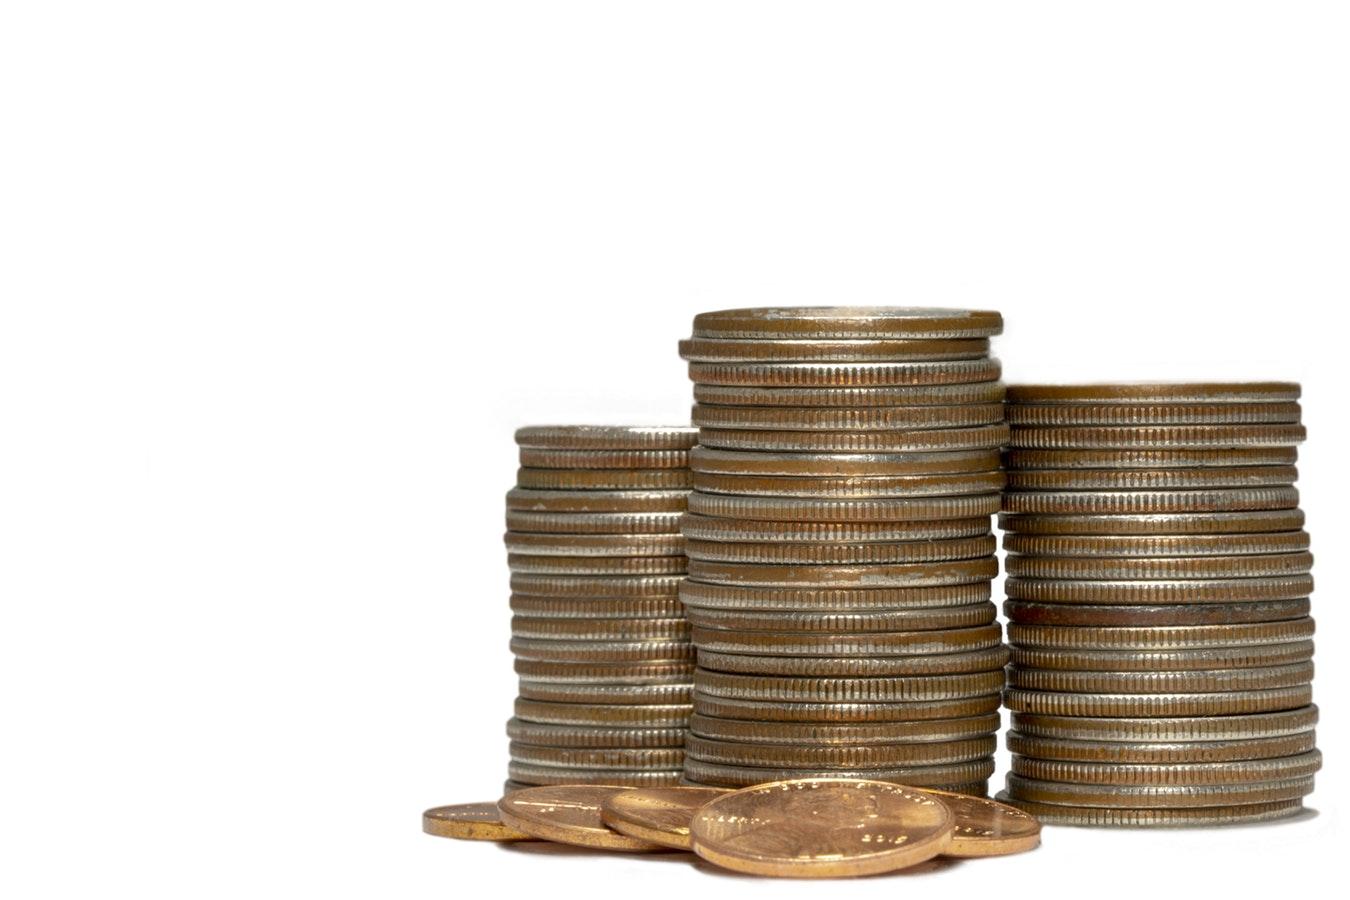 £109m investment creates 359 high-tech jobs